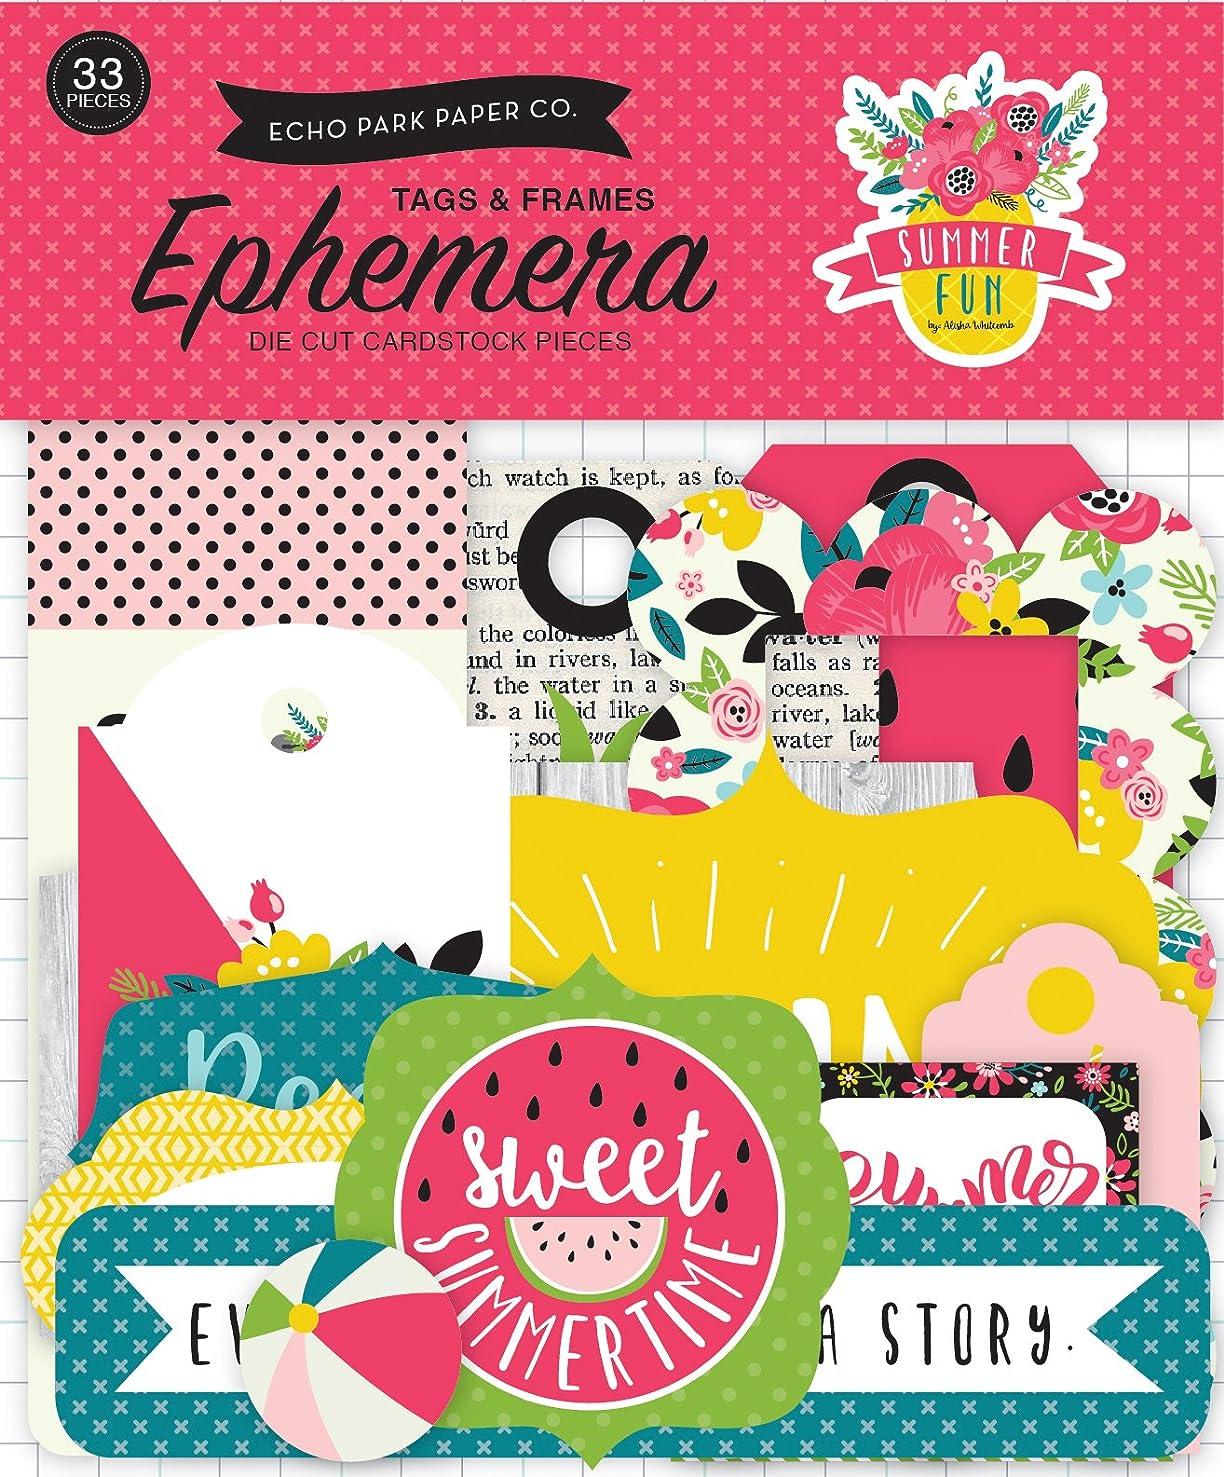 Echo Park Paper Company Summer Fun Frames & Tags Ephemera